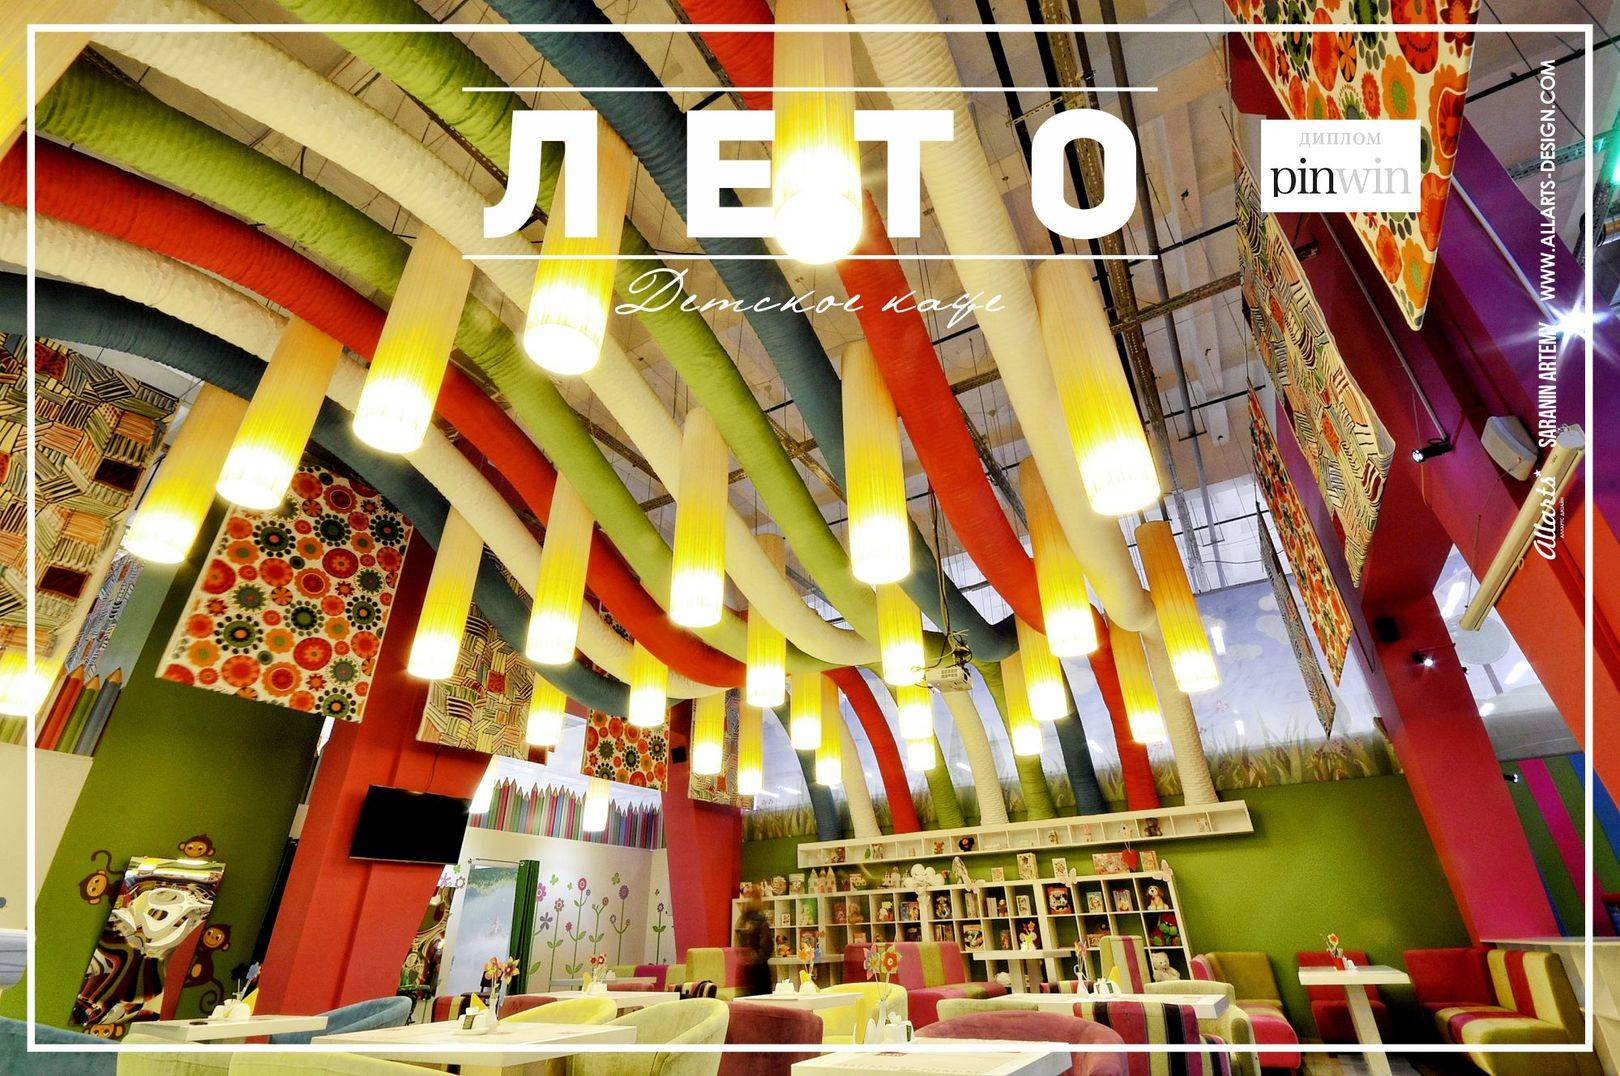 Дизайн интерьера кафе Лето